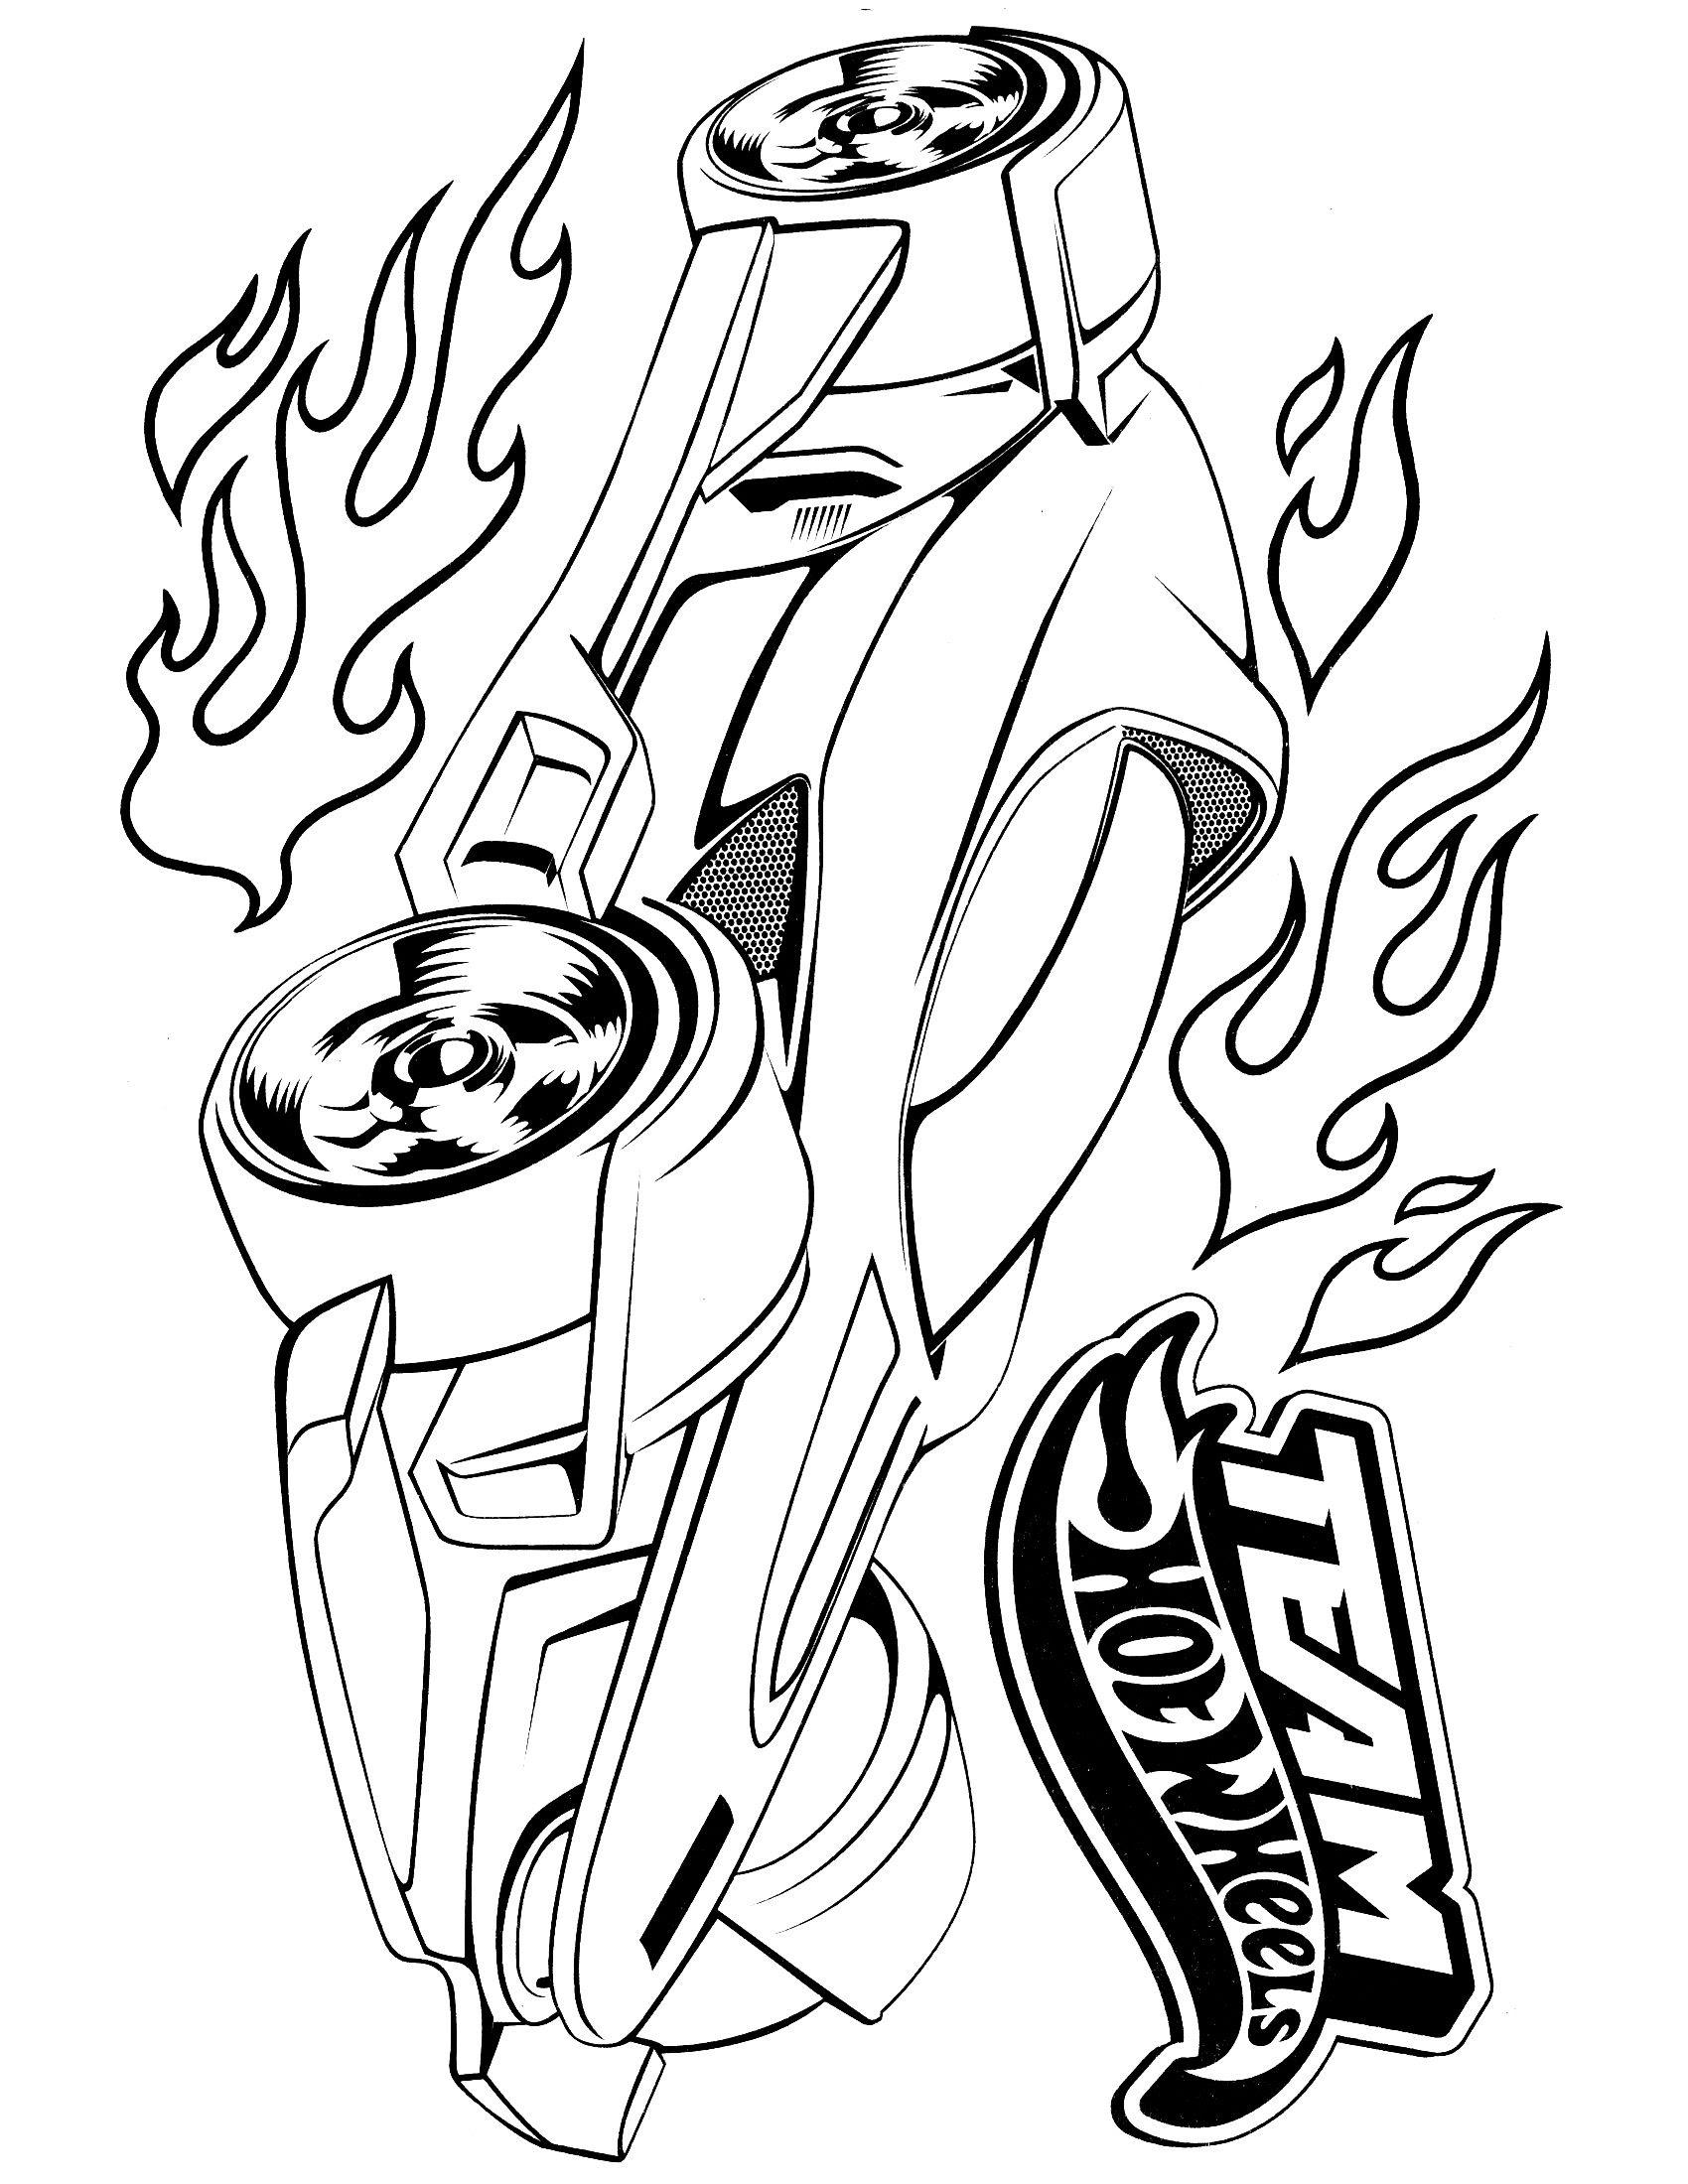 Transformers Boyama Sayfalari Auto Electrical Wiring Diagram